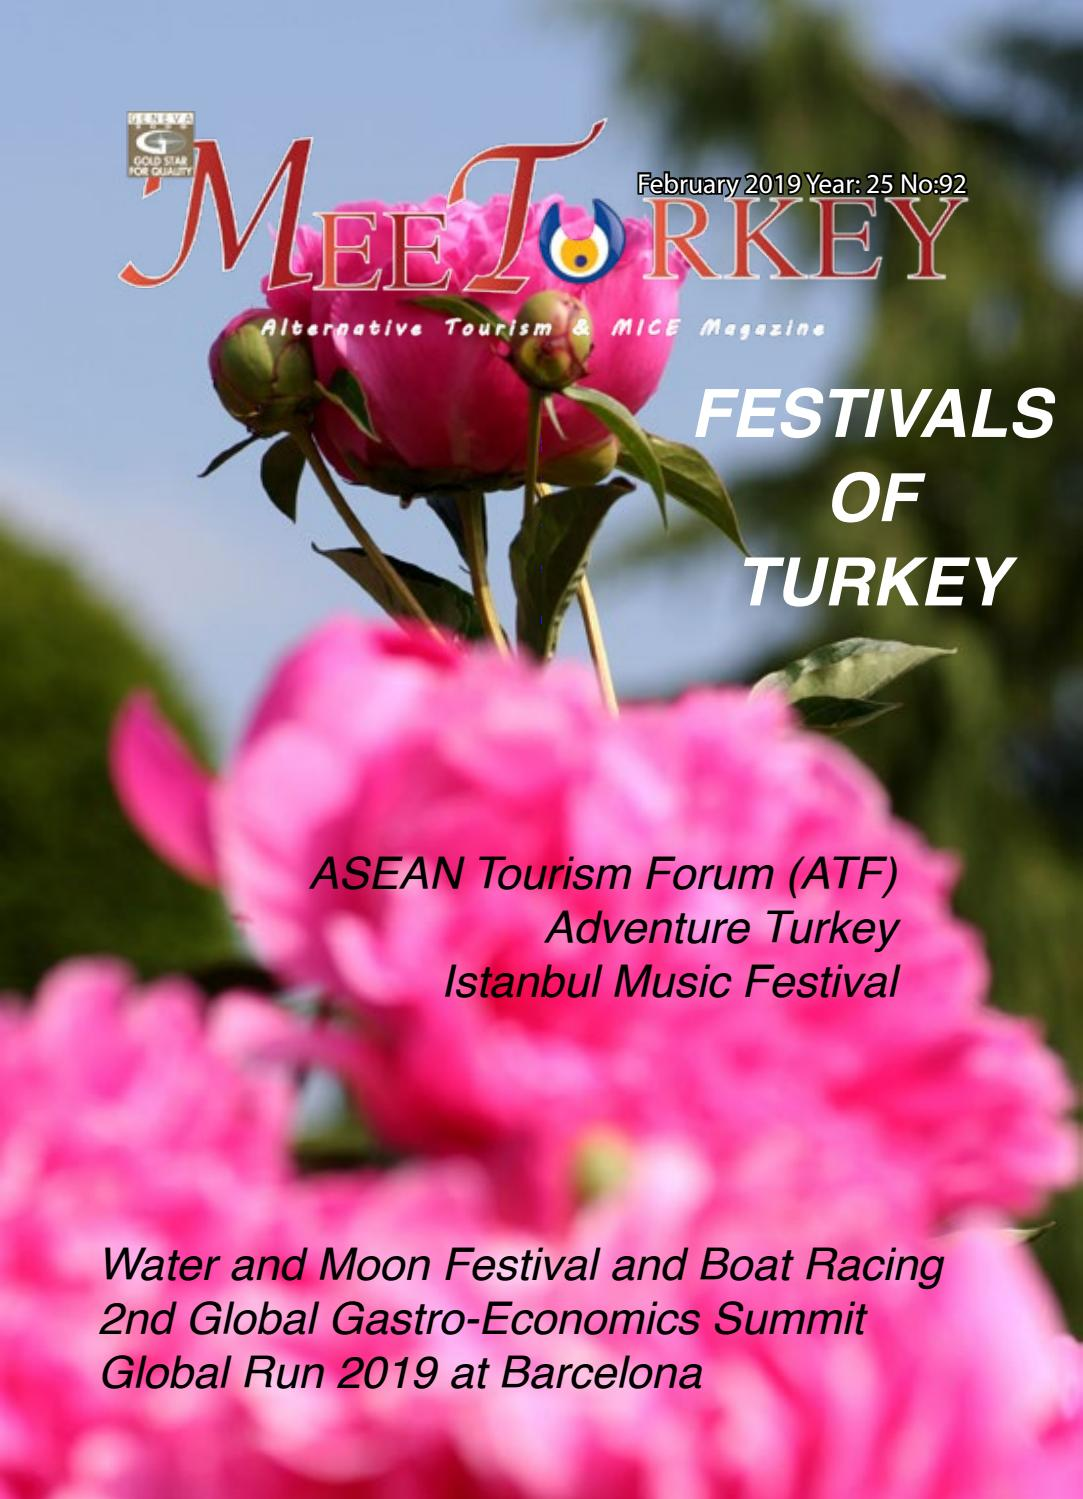 MeeTurkey Alternative Tourism & MICE Magazine - February